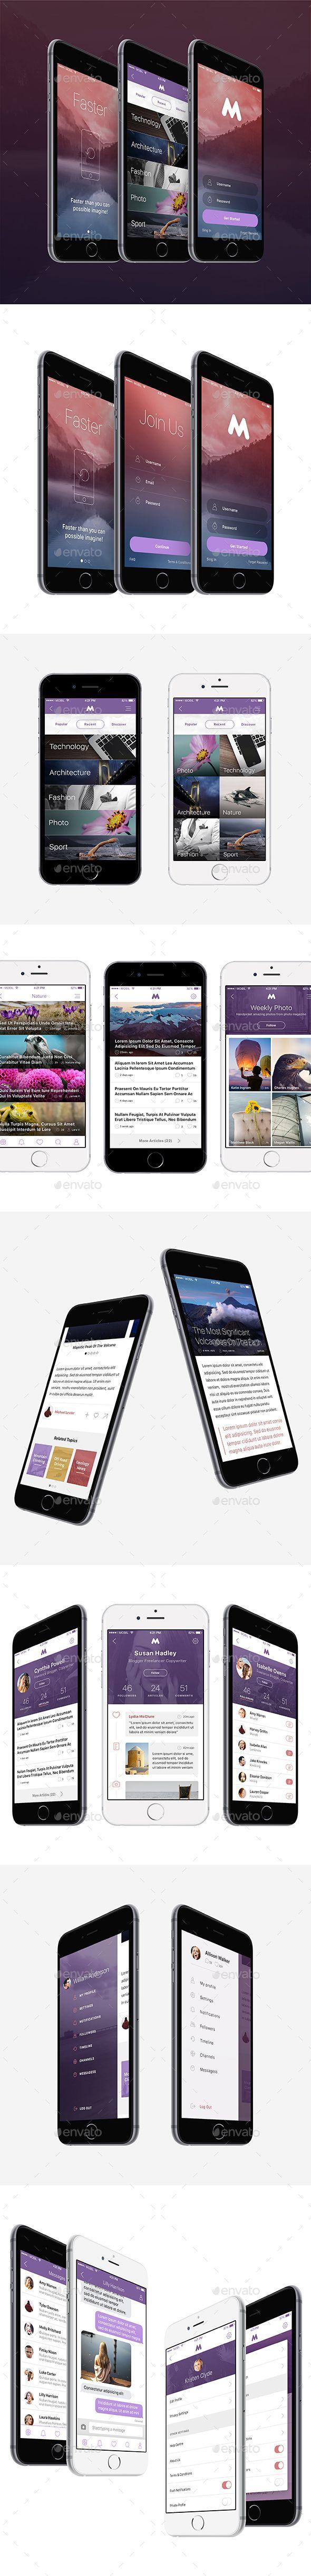 Megap - IOS 9 App User Interface Template PSD #design #ui Download: http://graphicriver.net/item/megap-ios-9-app-template/13787626?ref=ksioks